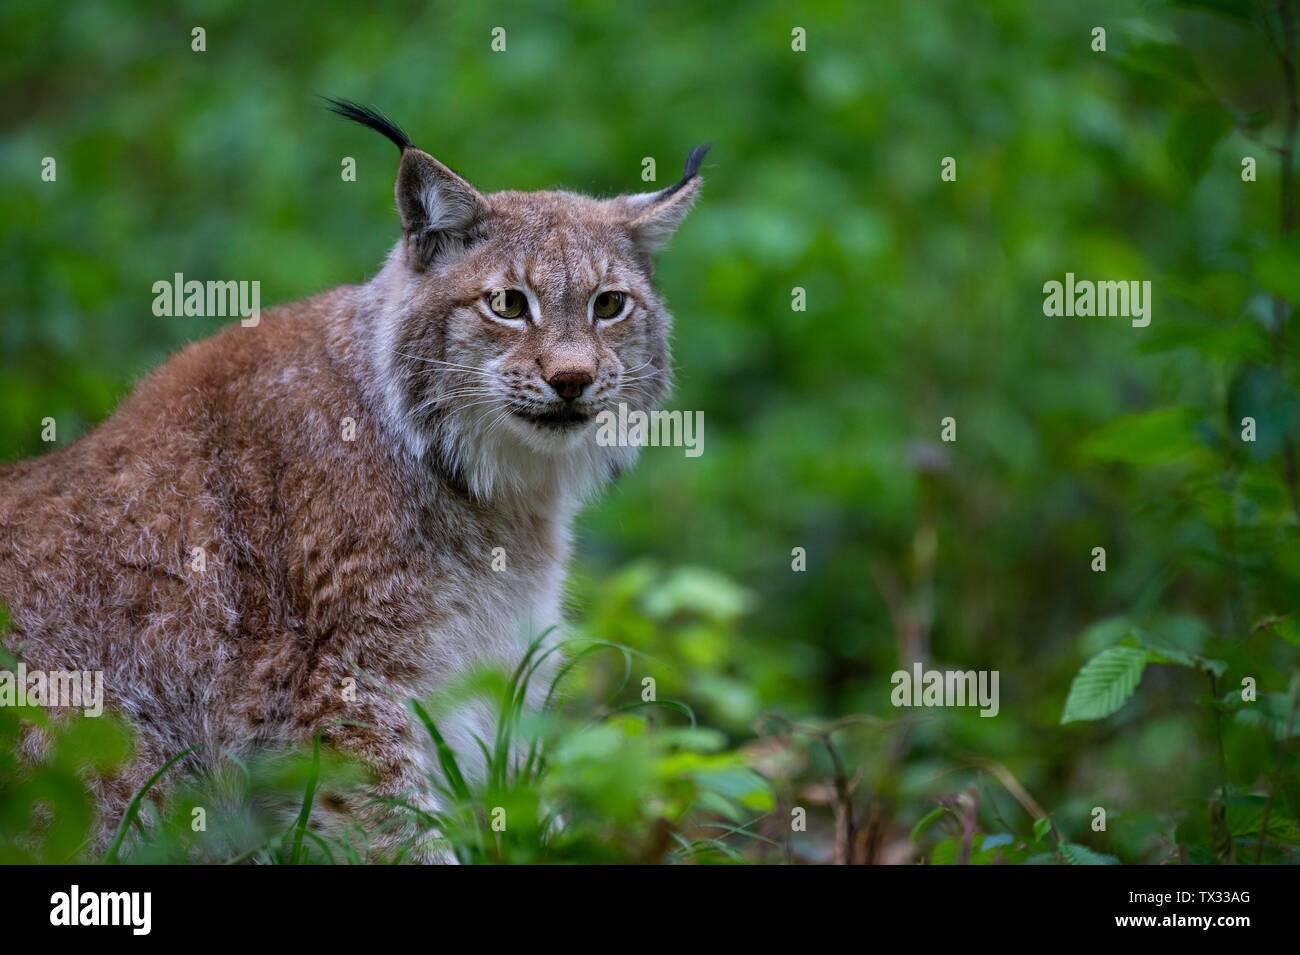 Eurasian lynx (Lynx lynx), sits in forest, Saarland, Germany Stock Photo